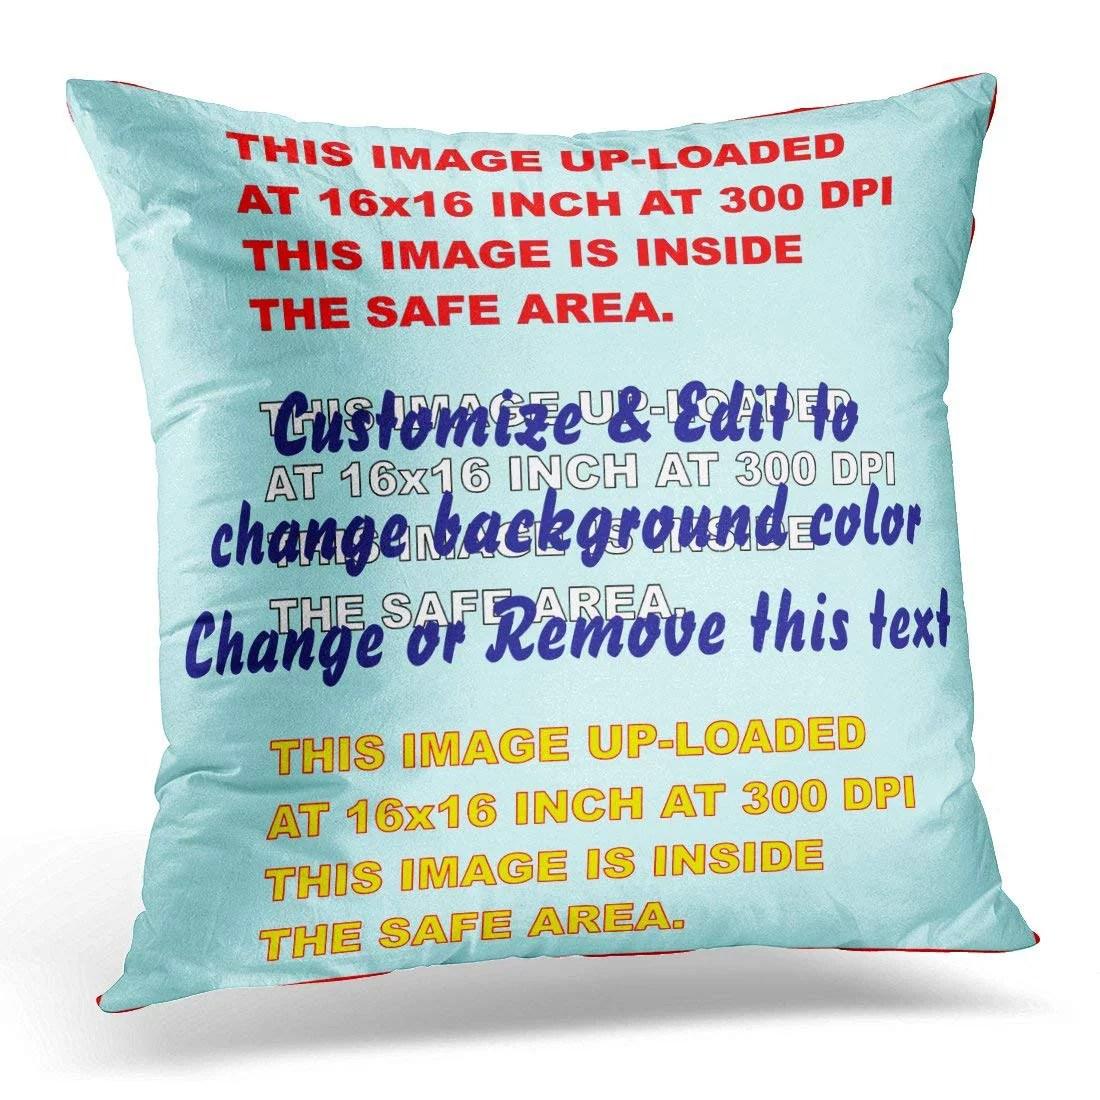 bpbop throw polyester pillowcase cover 16x16 inch walmart com